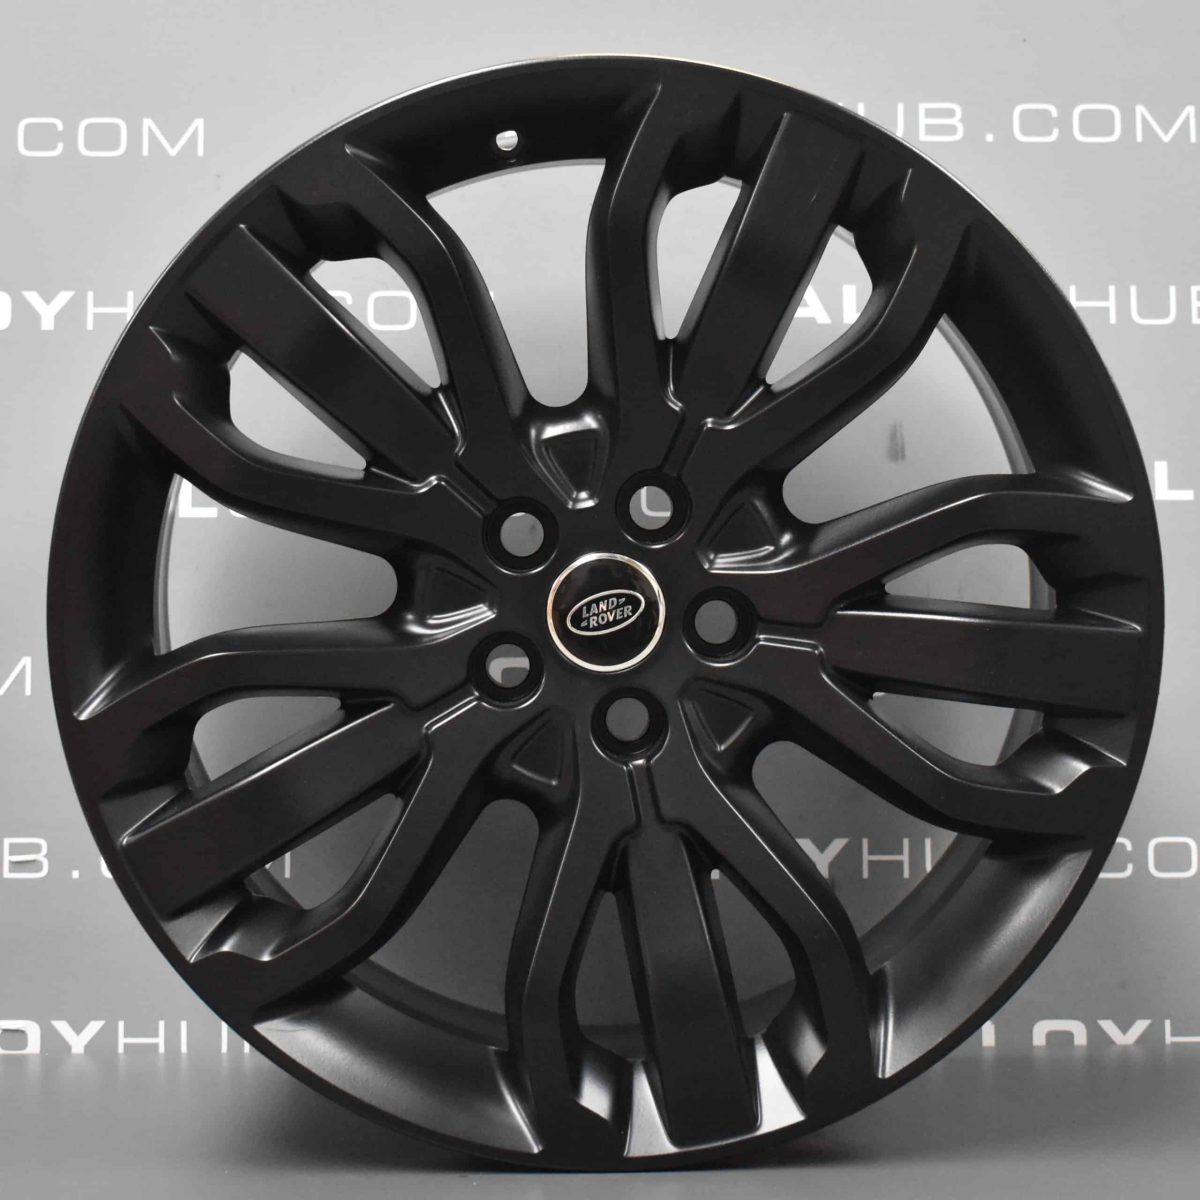 "Genuine Land Rover Range Rover Style 5007 21"" inch 5 Split-Spoke Alloy Wheels with Satin Black Finish VPLWW0091"